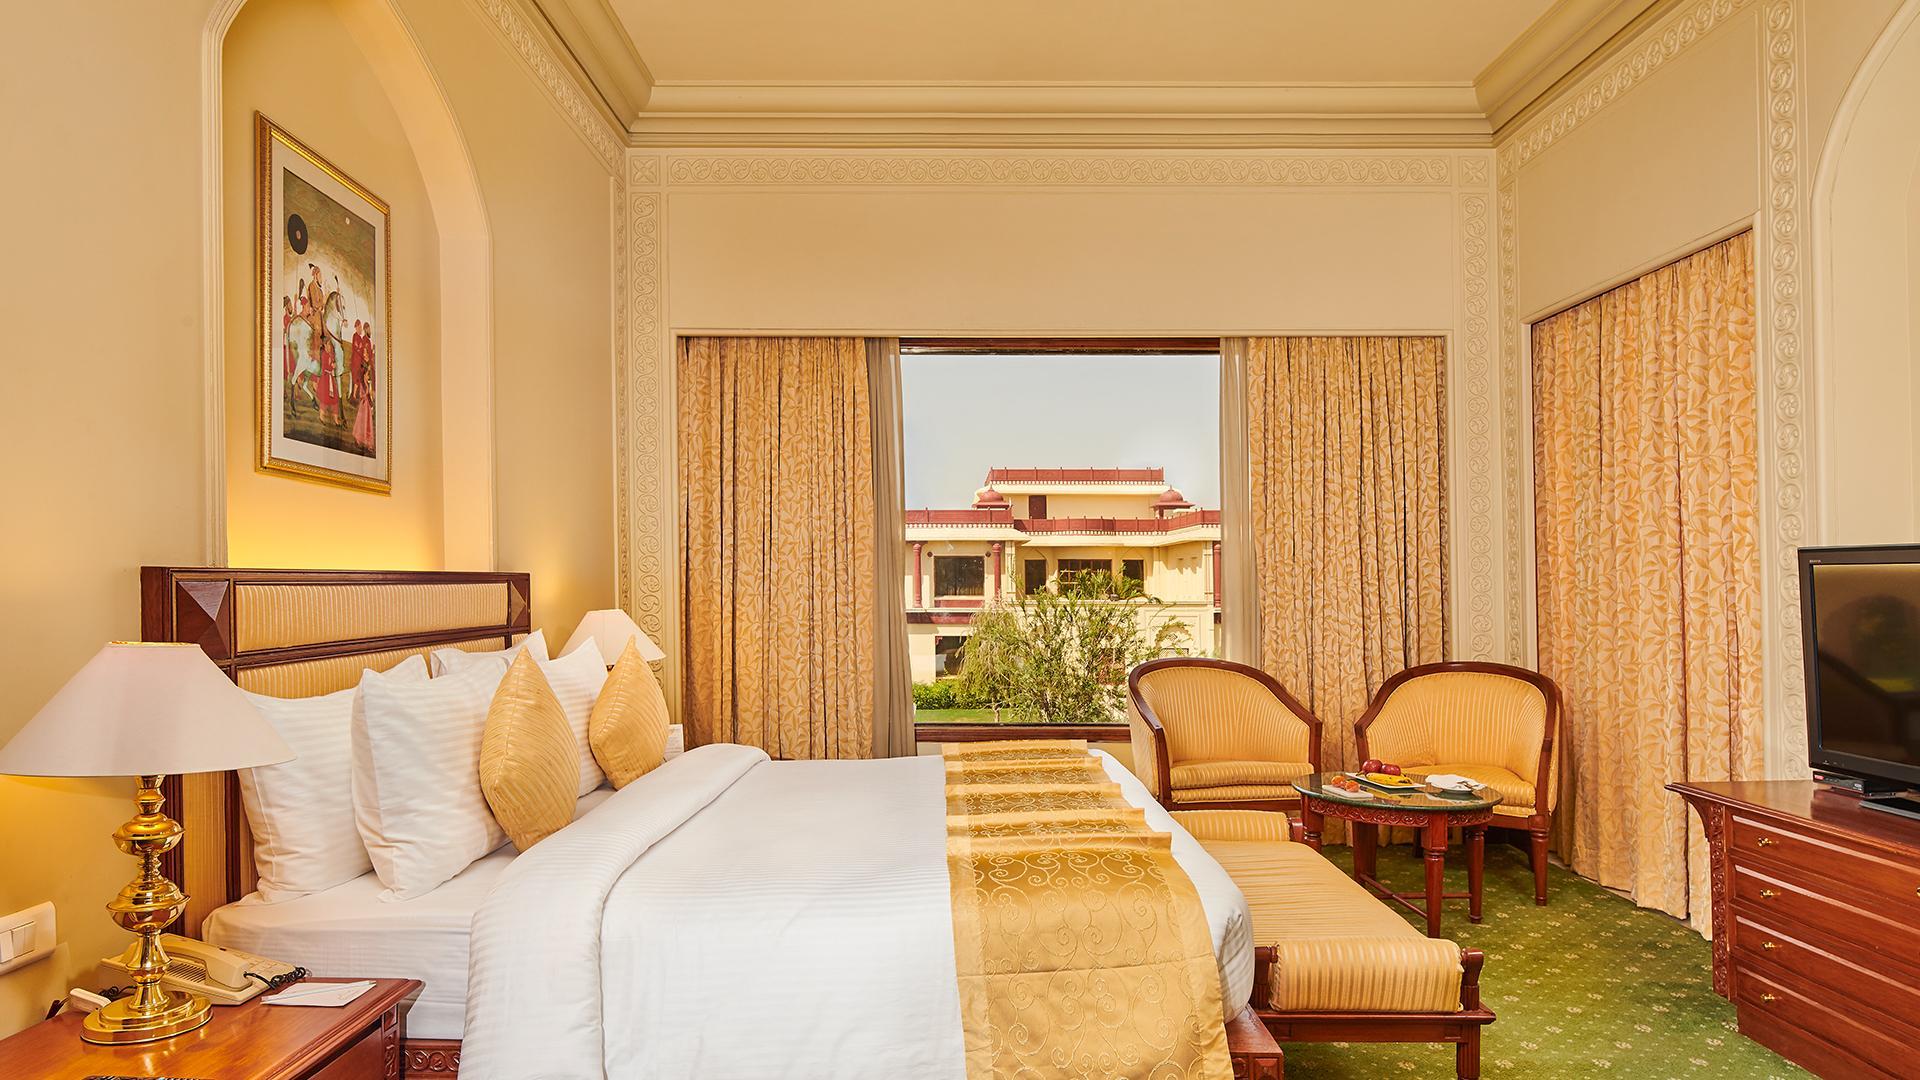 Luxury Suite image 1 at The Ummed Palace Resort & Spa, Jodhpur by Jodhpur, Rajasthan, India